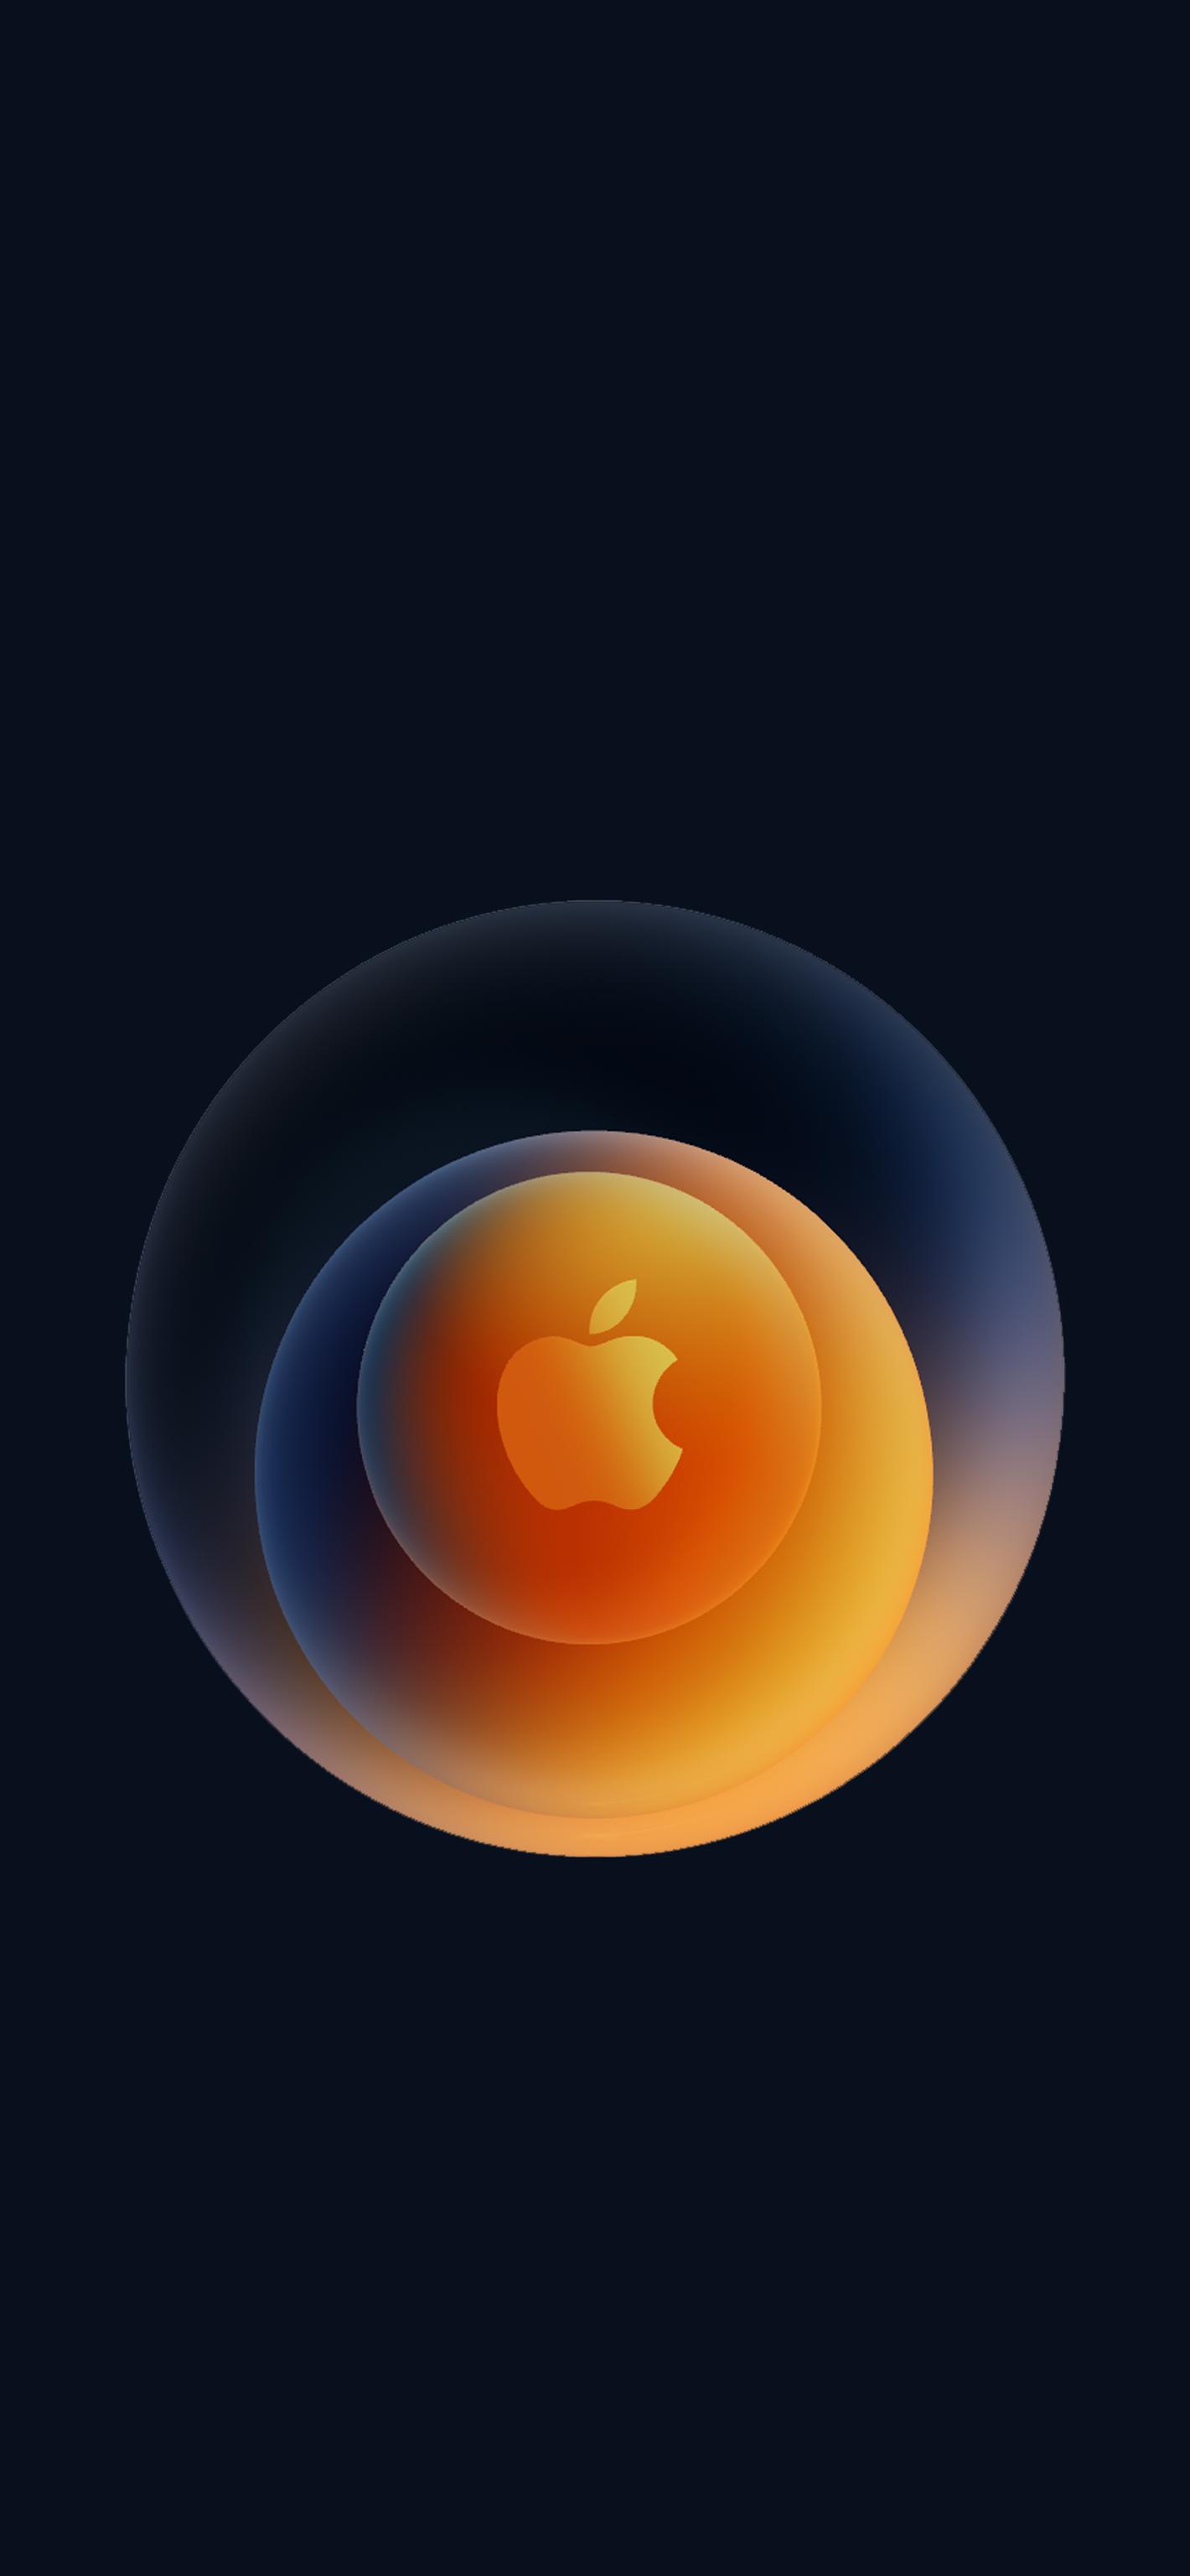 Apple Logo Iphone 12 Wallpapers Wallpaper Cave